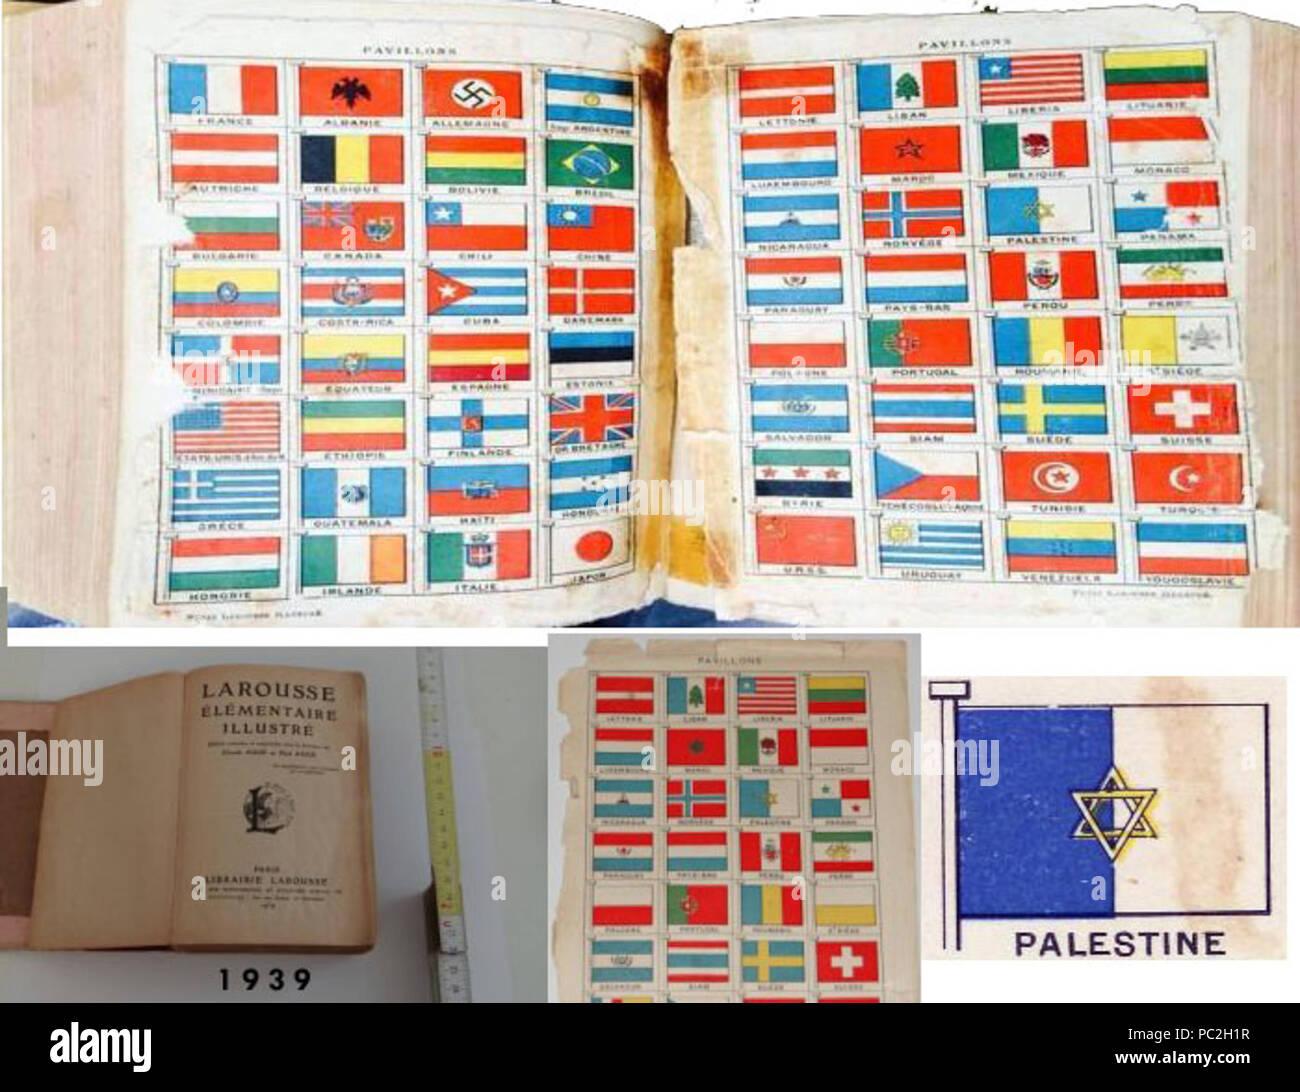 464 Palestin-flag-1939 - Stock Image